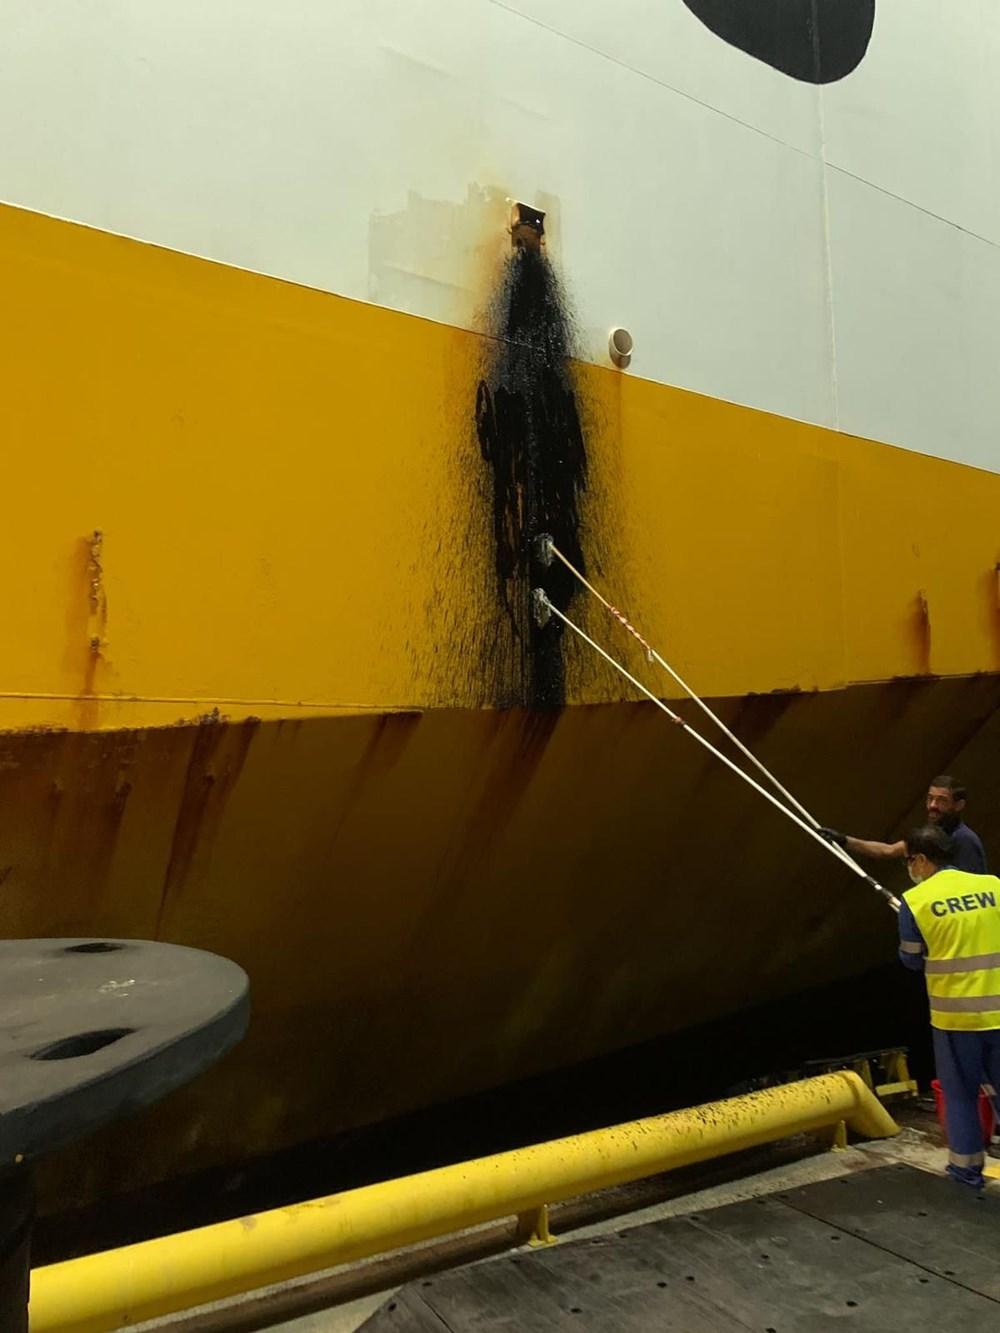 İzmit Körfezi'ni kirleten gemiye 3,4 milyon lira ceza uygulandı - 6